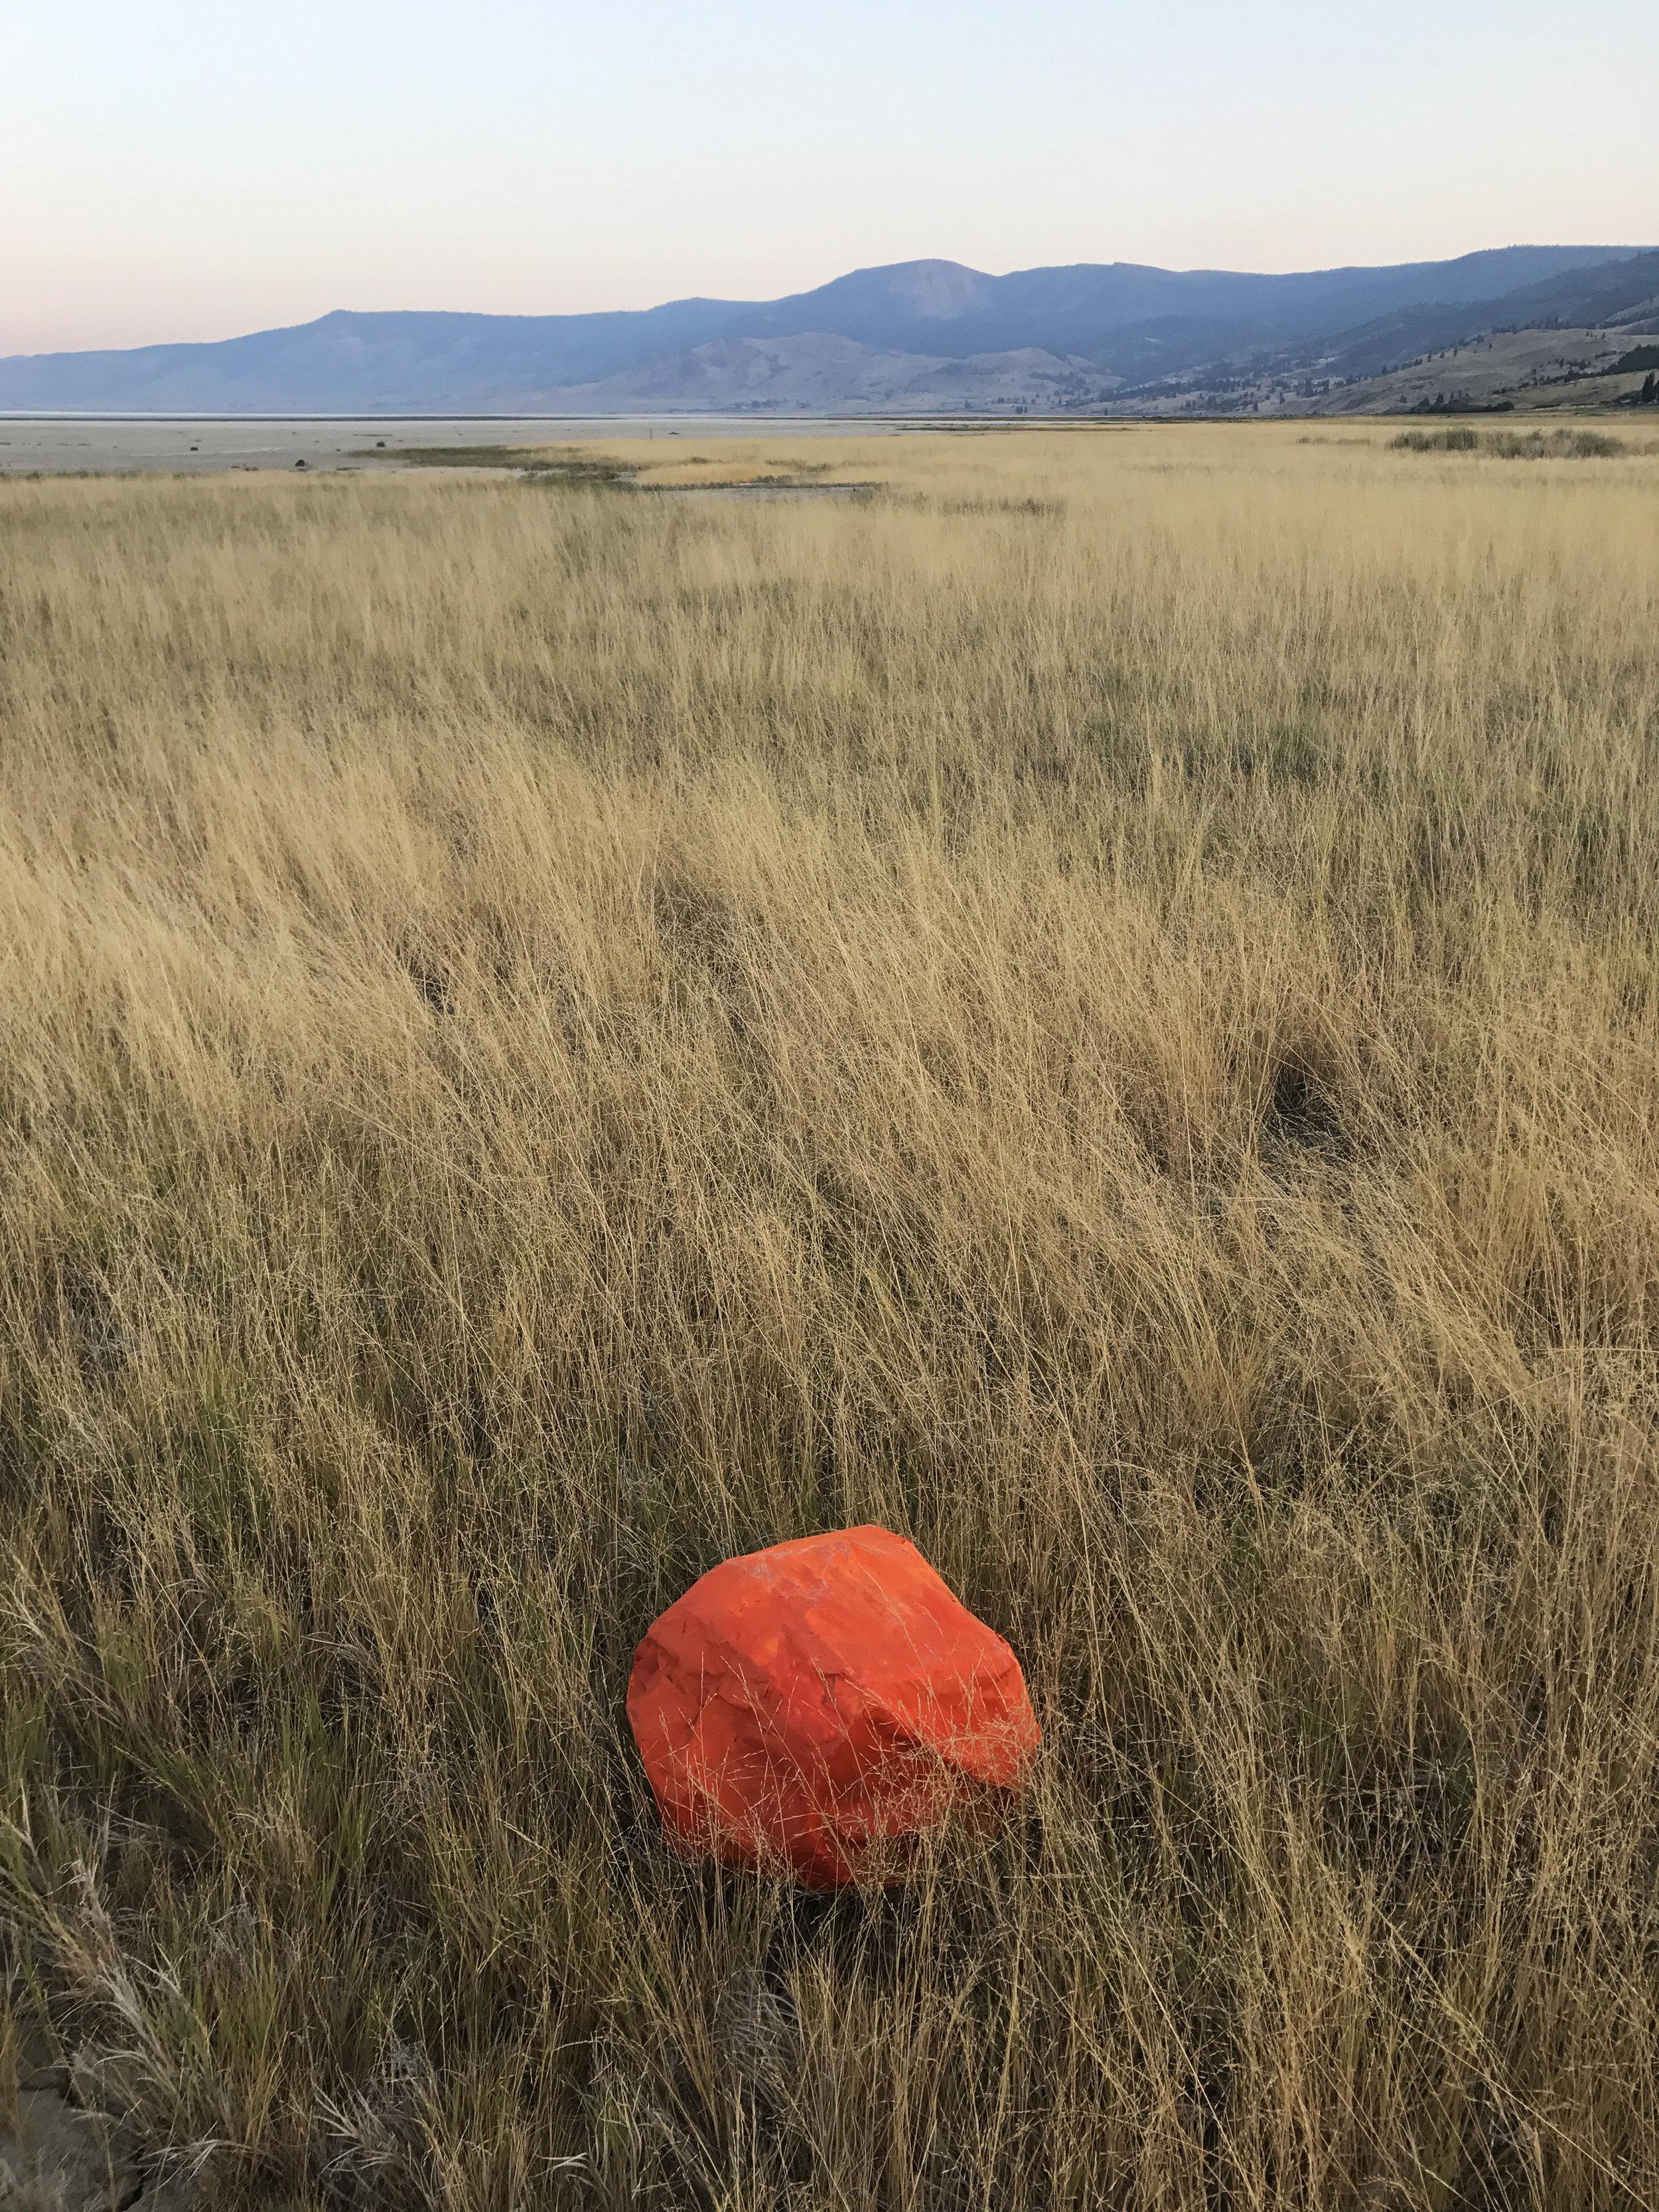 Rock Portrait (Orange in Grass)